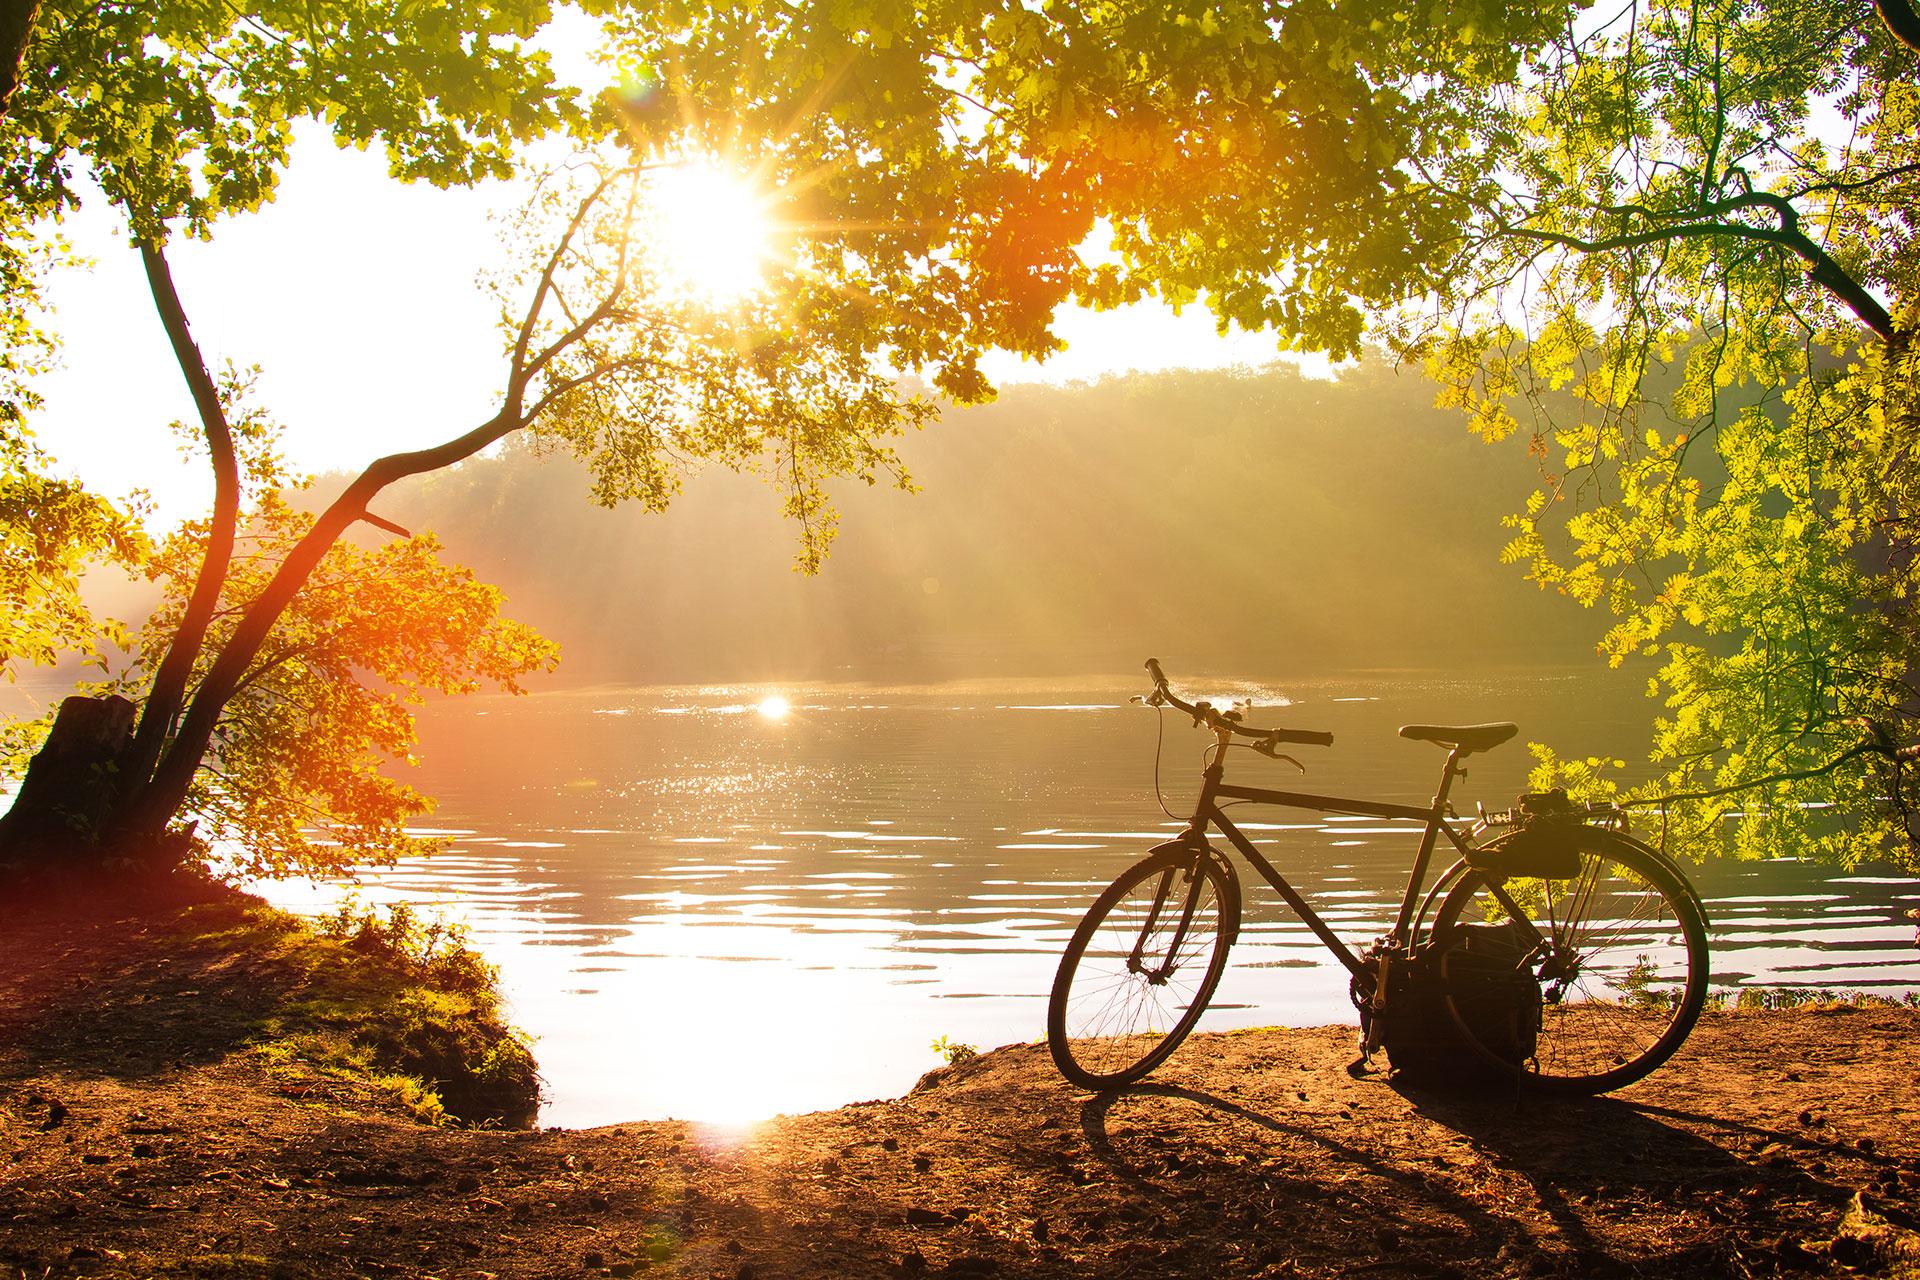 fahrradfahren_parkhotel_landau_120556313_subscription_xxl